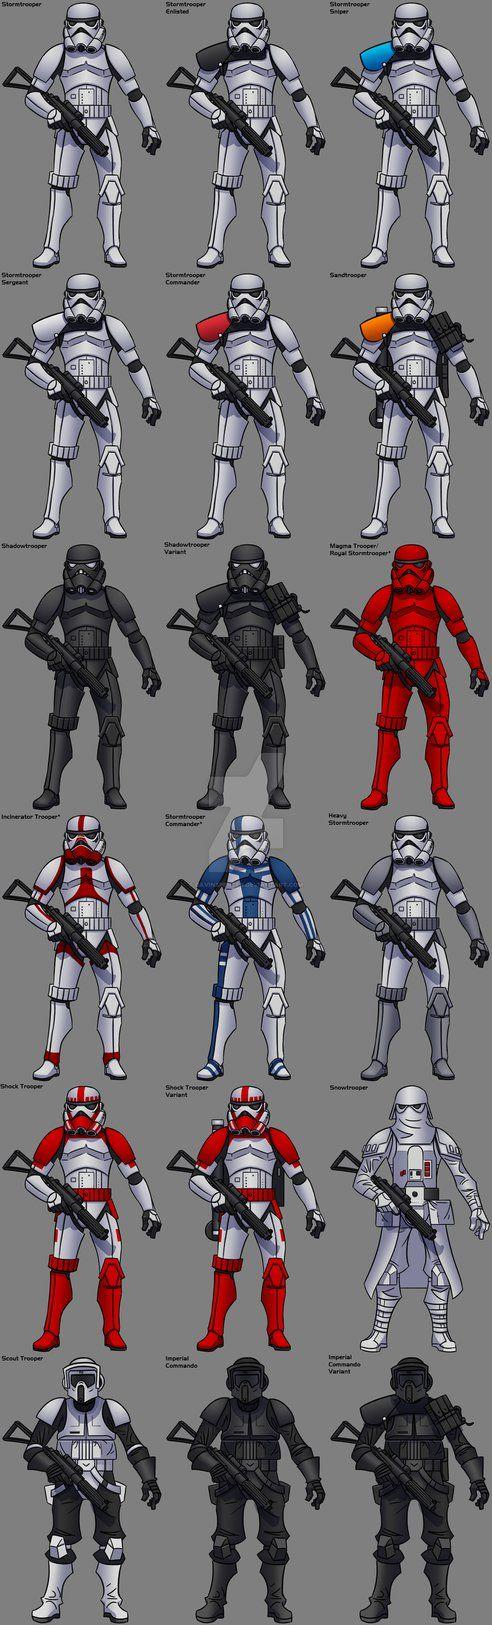 Imperial Military Variants by GavinSpencer